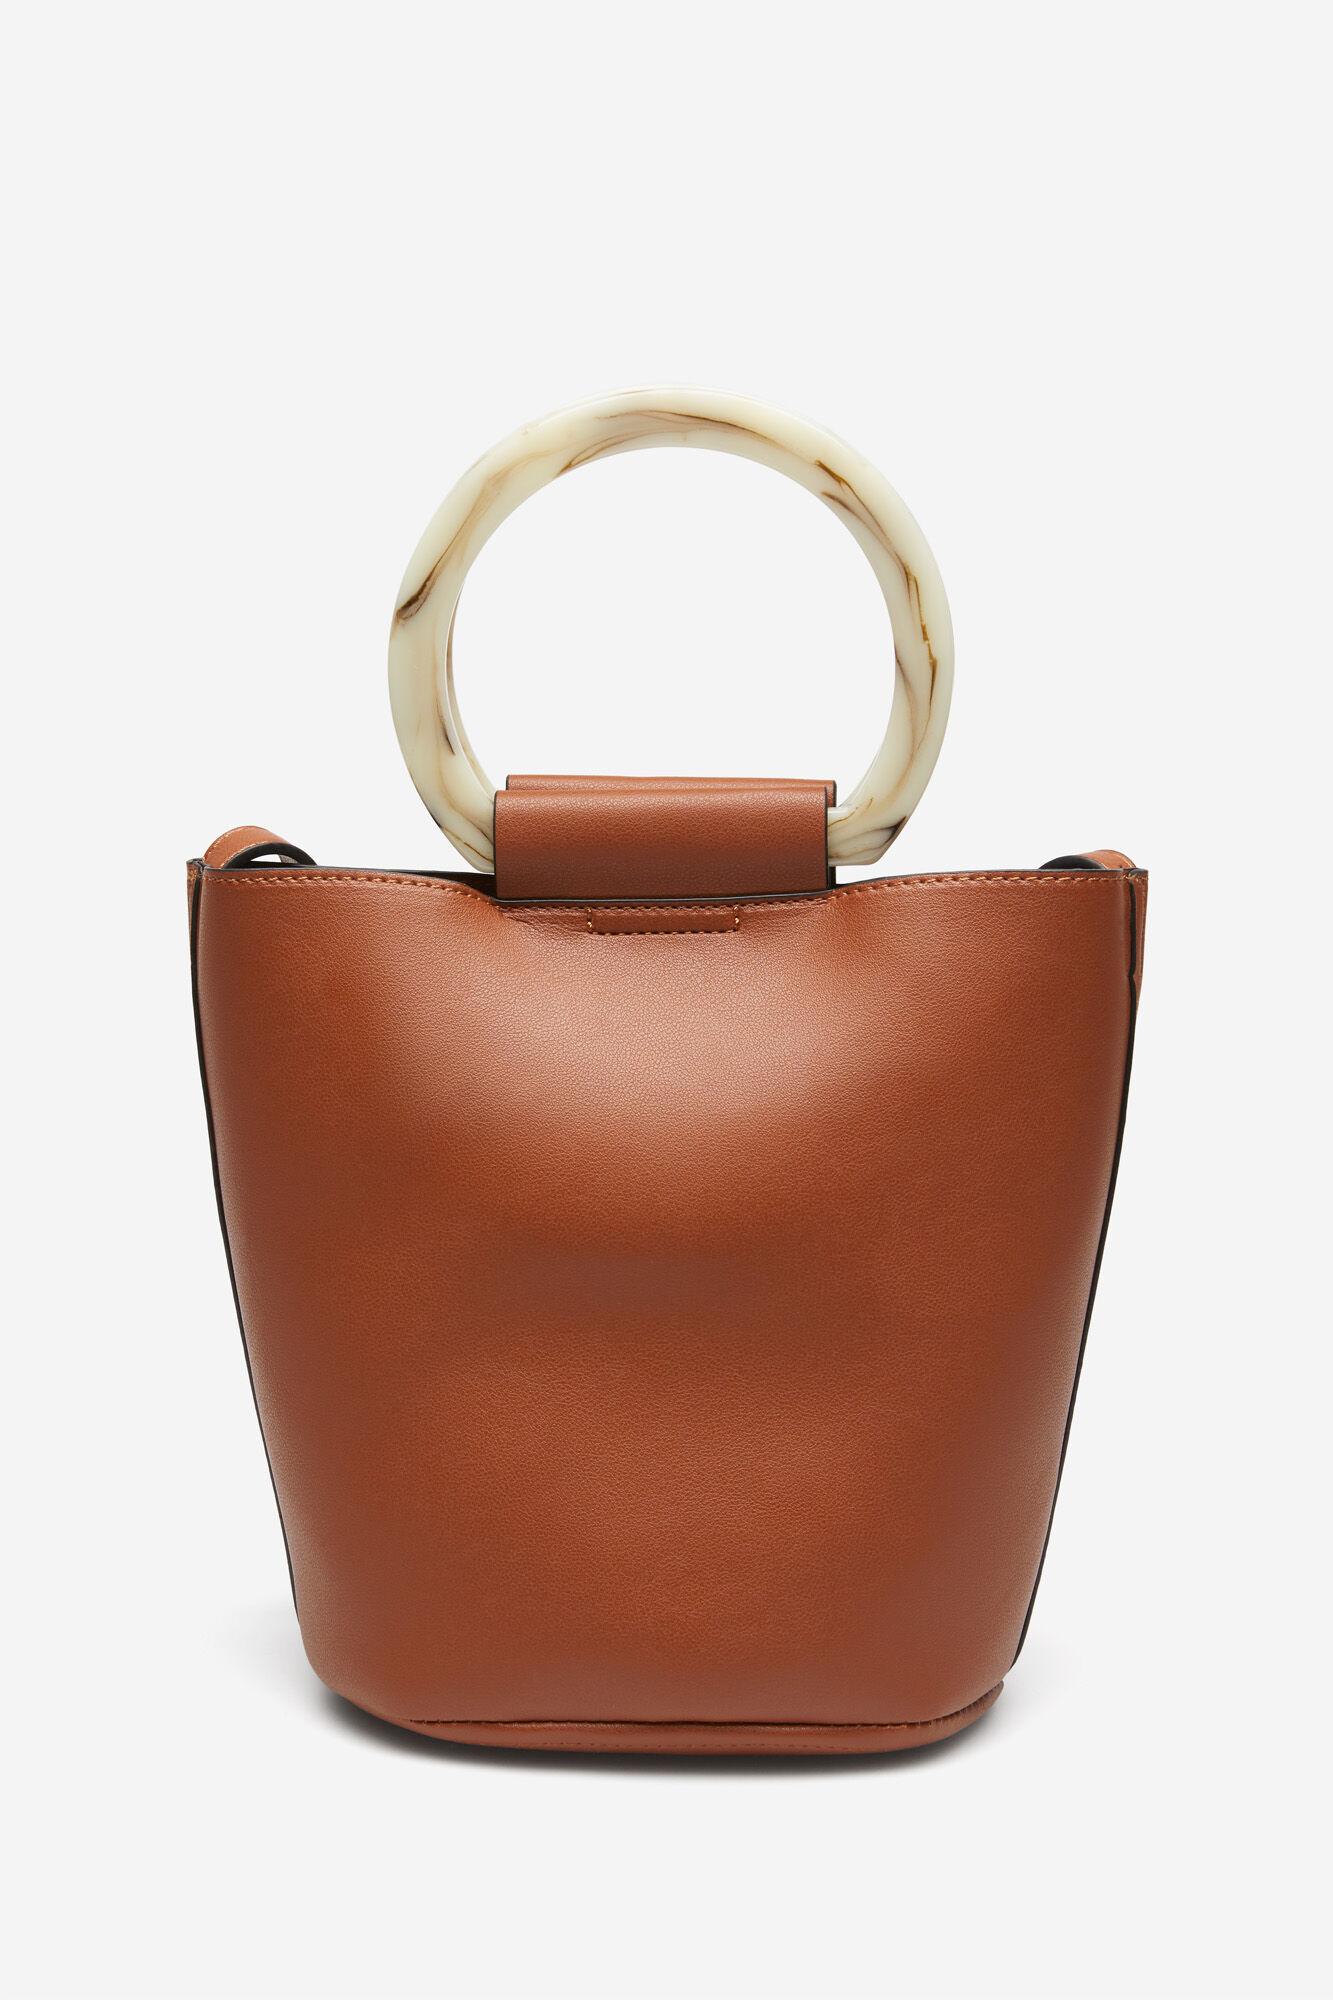 Bolso bucket, con cierre de imán, con asa larga para colgar y dos asas redondas de carey.